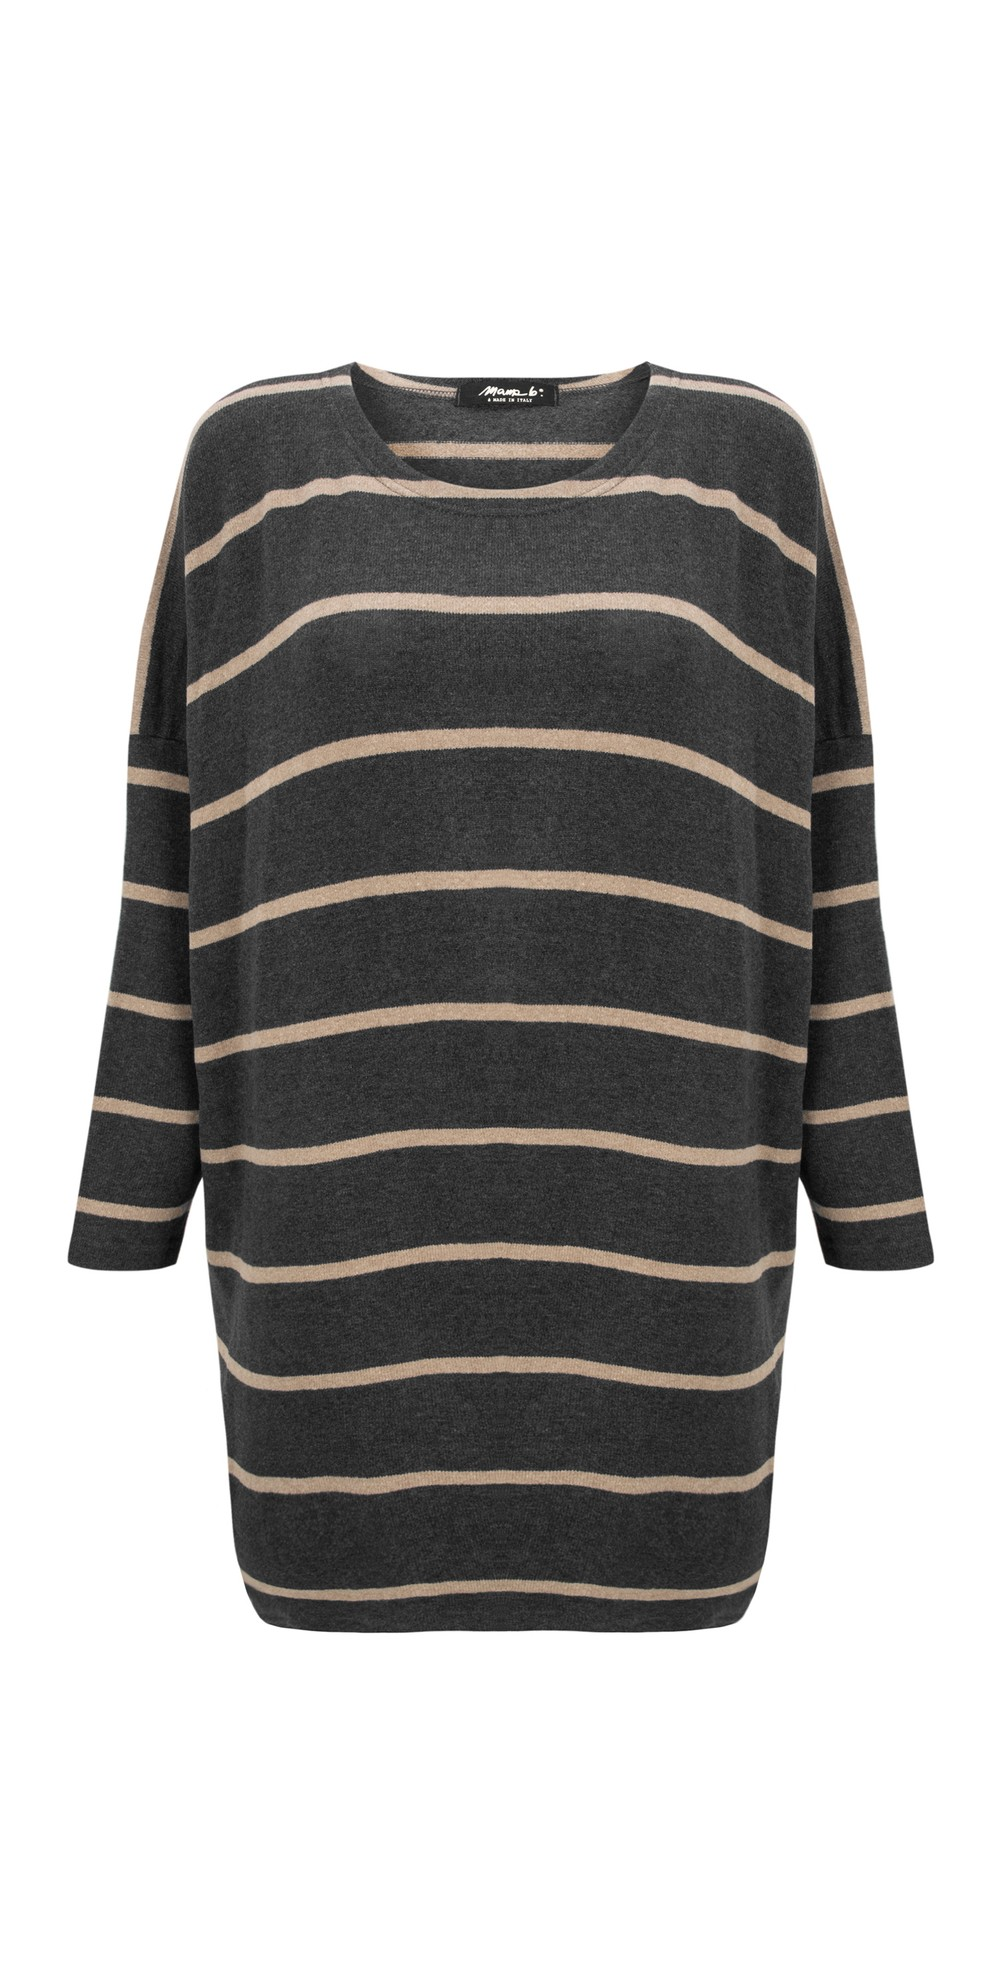 Grappa RG Wide Stripe Fleece Jumper main image